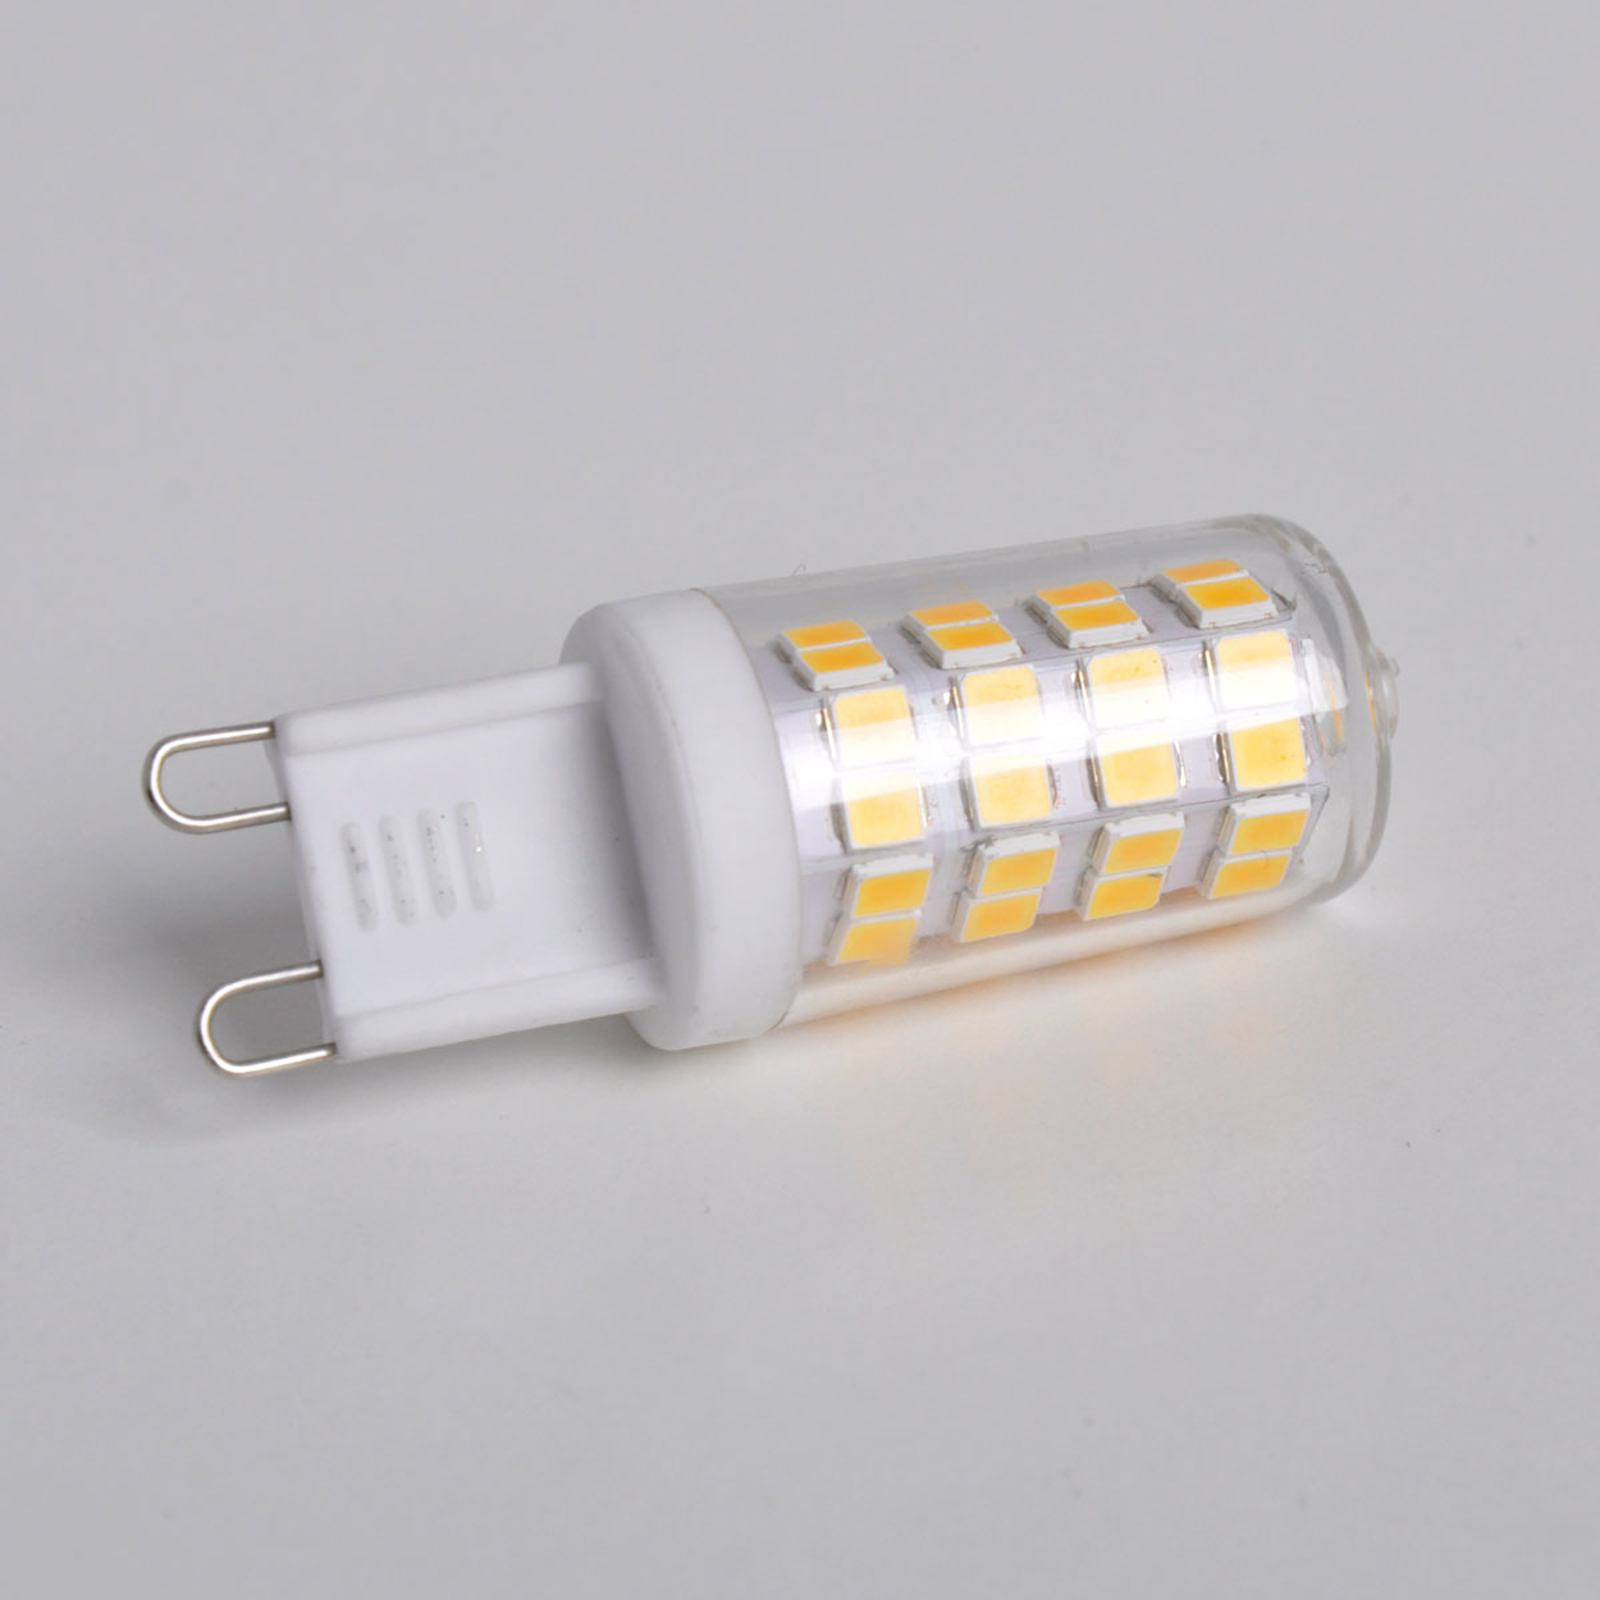 LED bi-pin bulb G9 3 W, warm white , 330 lumens_9992001_1